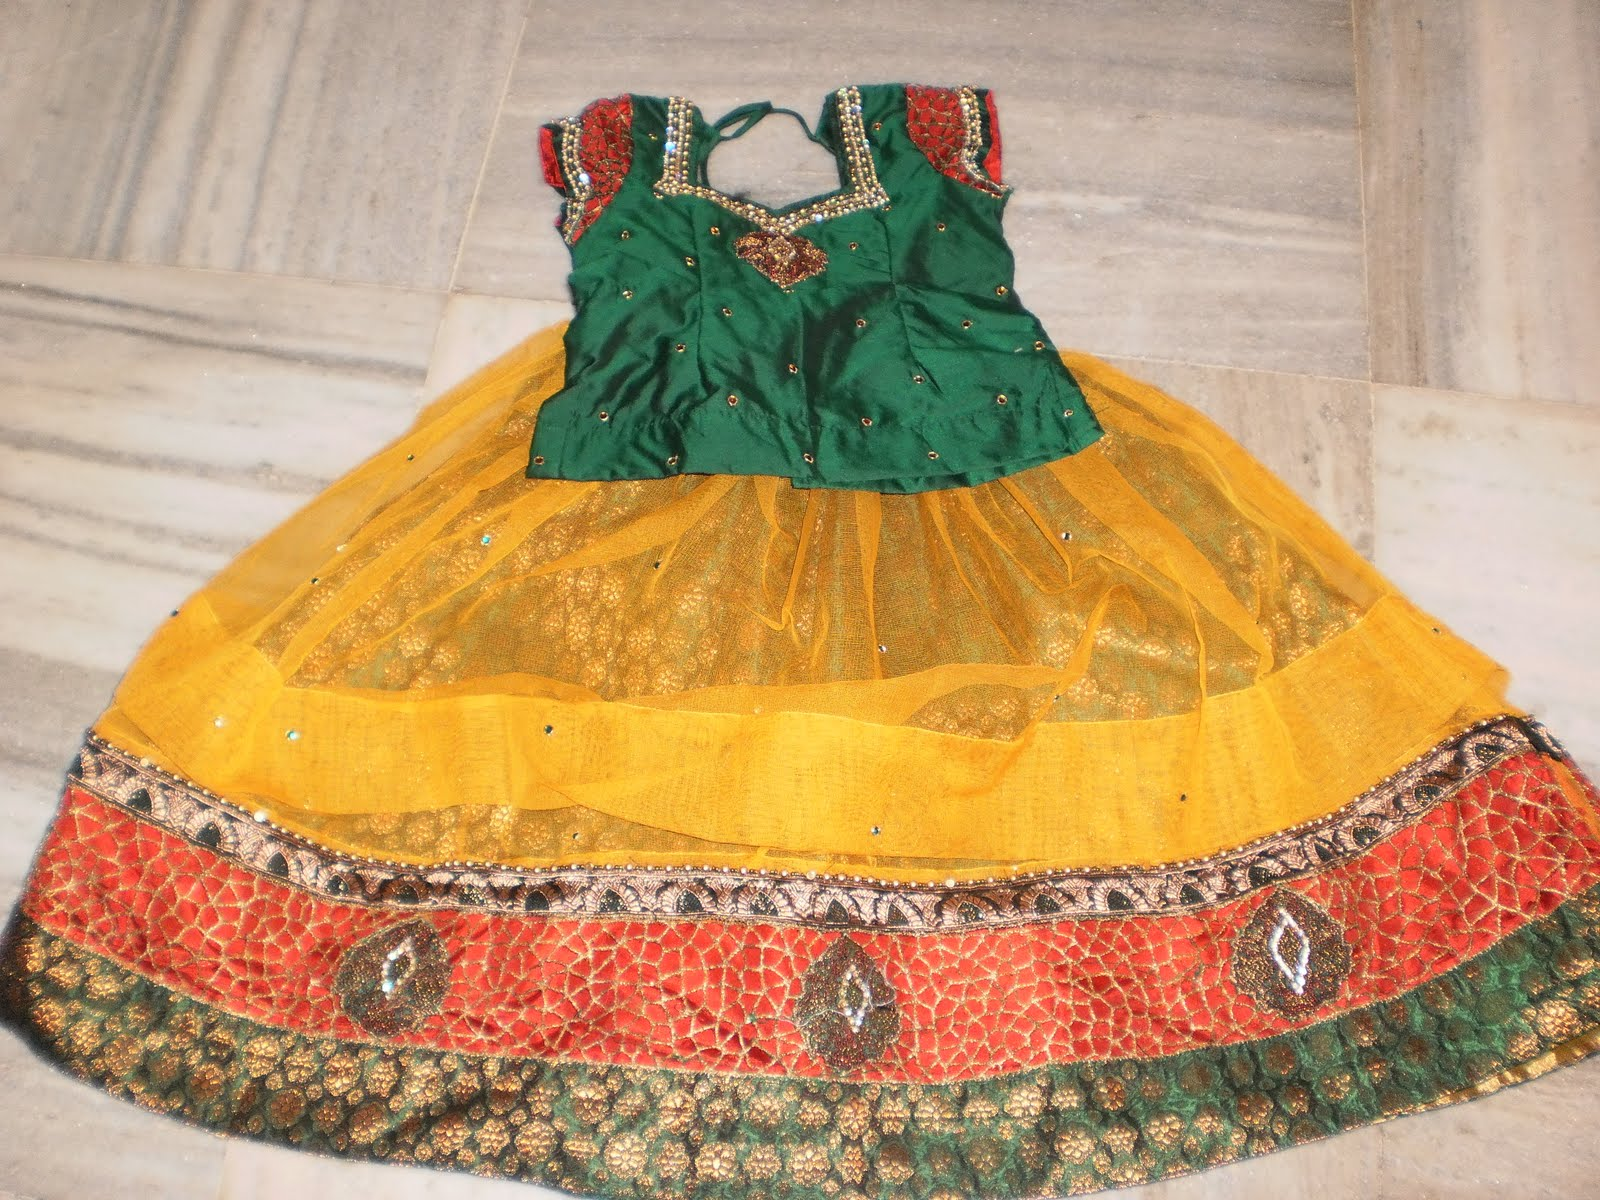 61f143db416ea Exclusive langa blouse designs for kids sparkling fashion JPG 1600x1200  Latest pattu langa designs